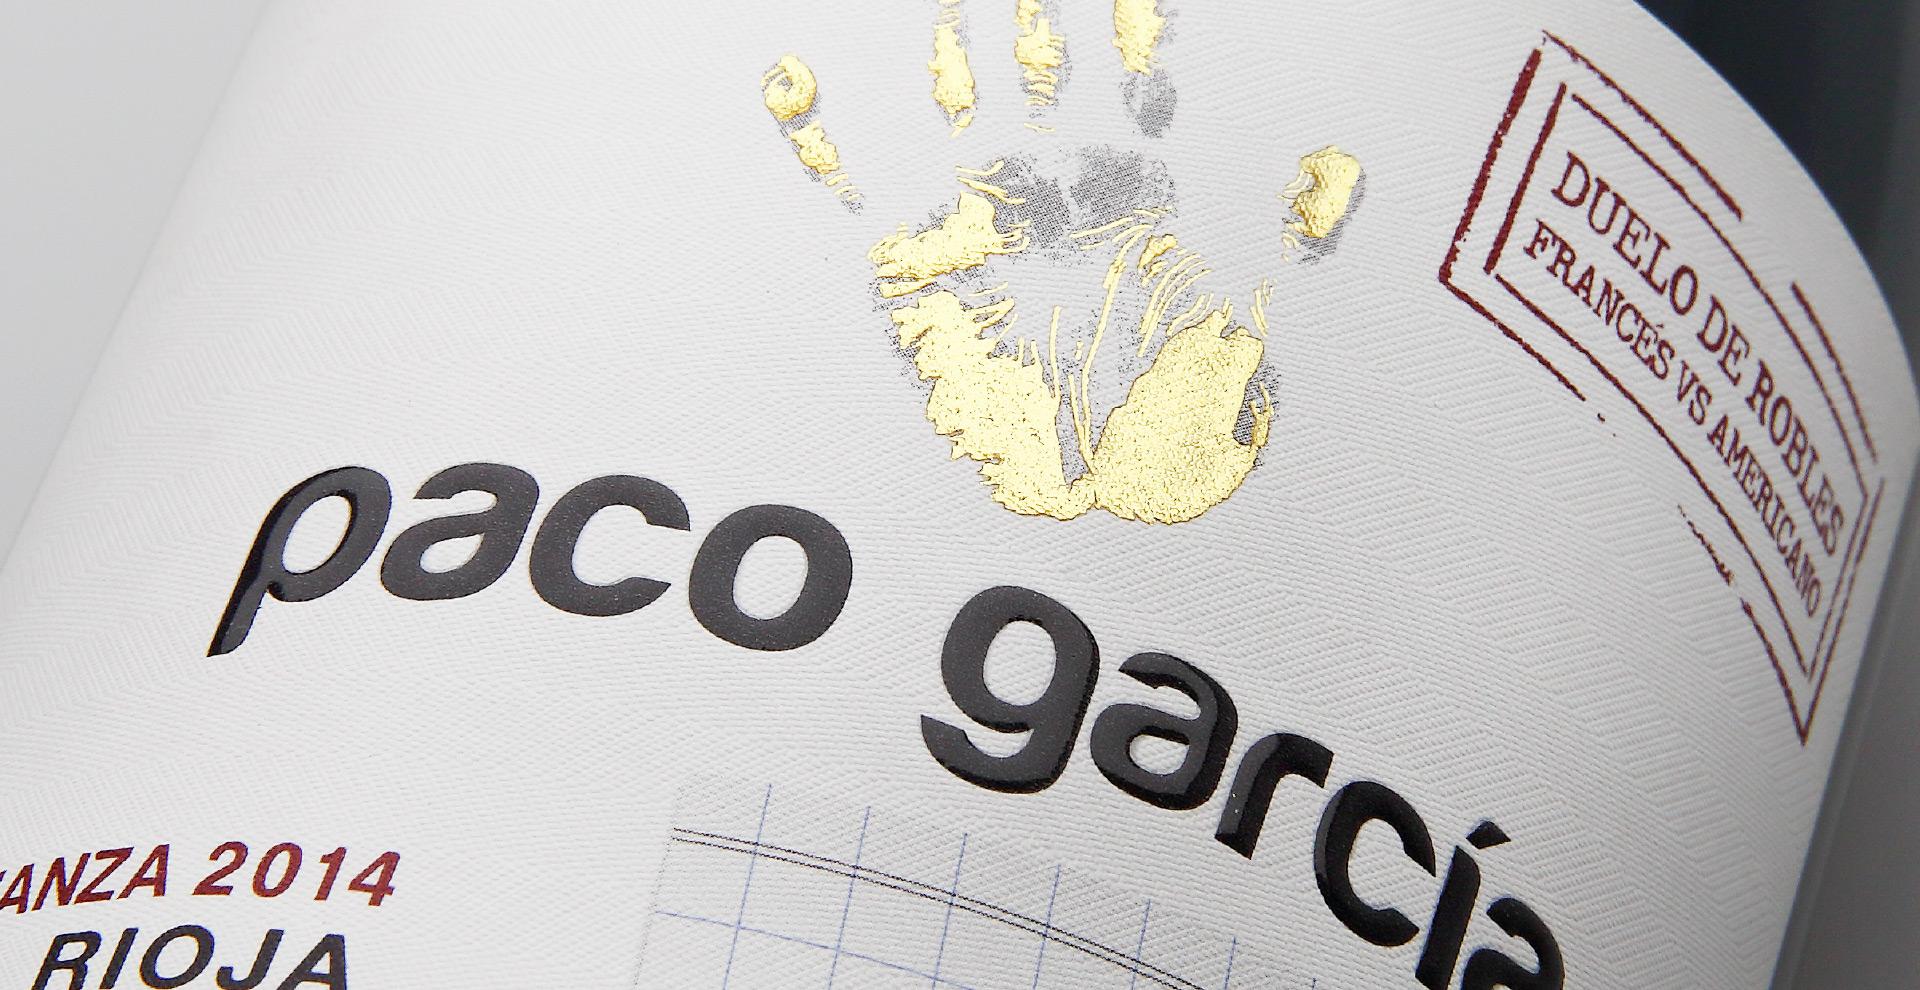 bodegas_paco_garcia-paco_garcia_experiencias-cabecera